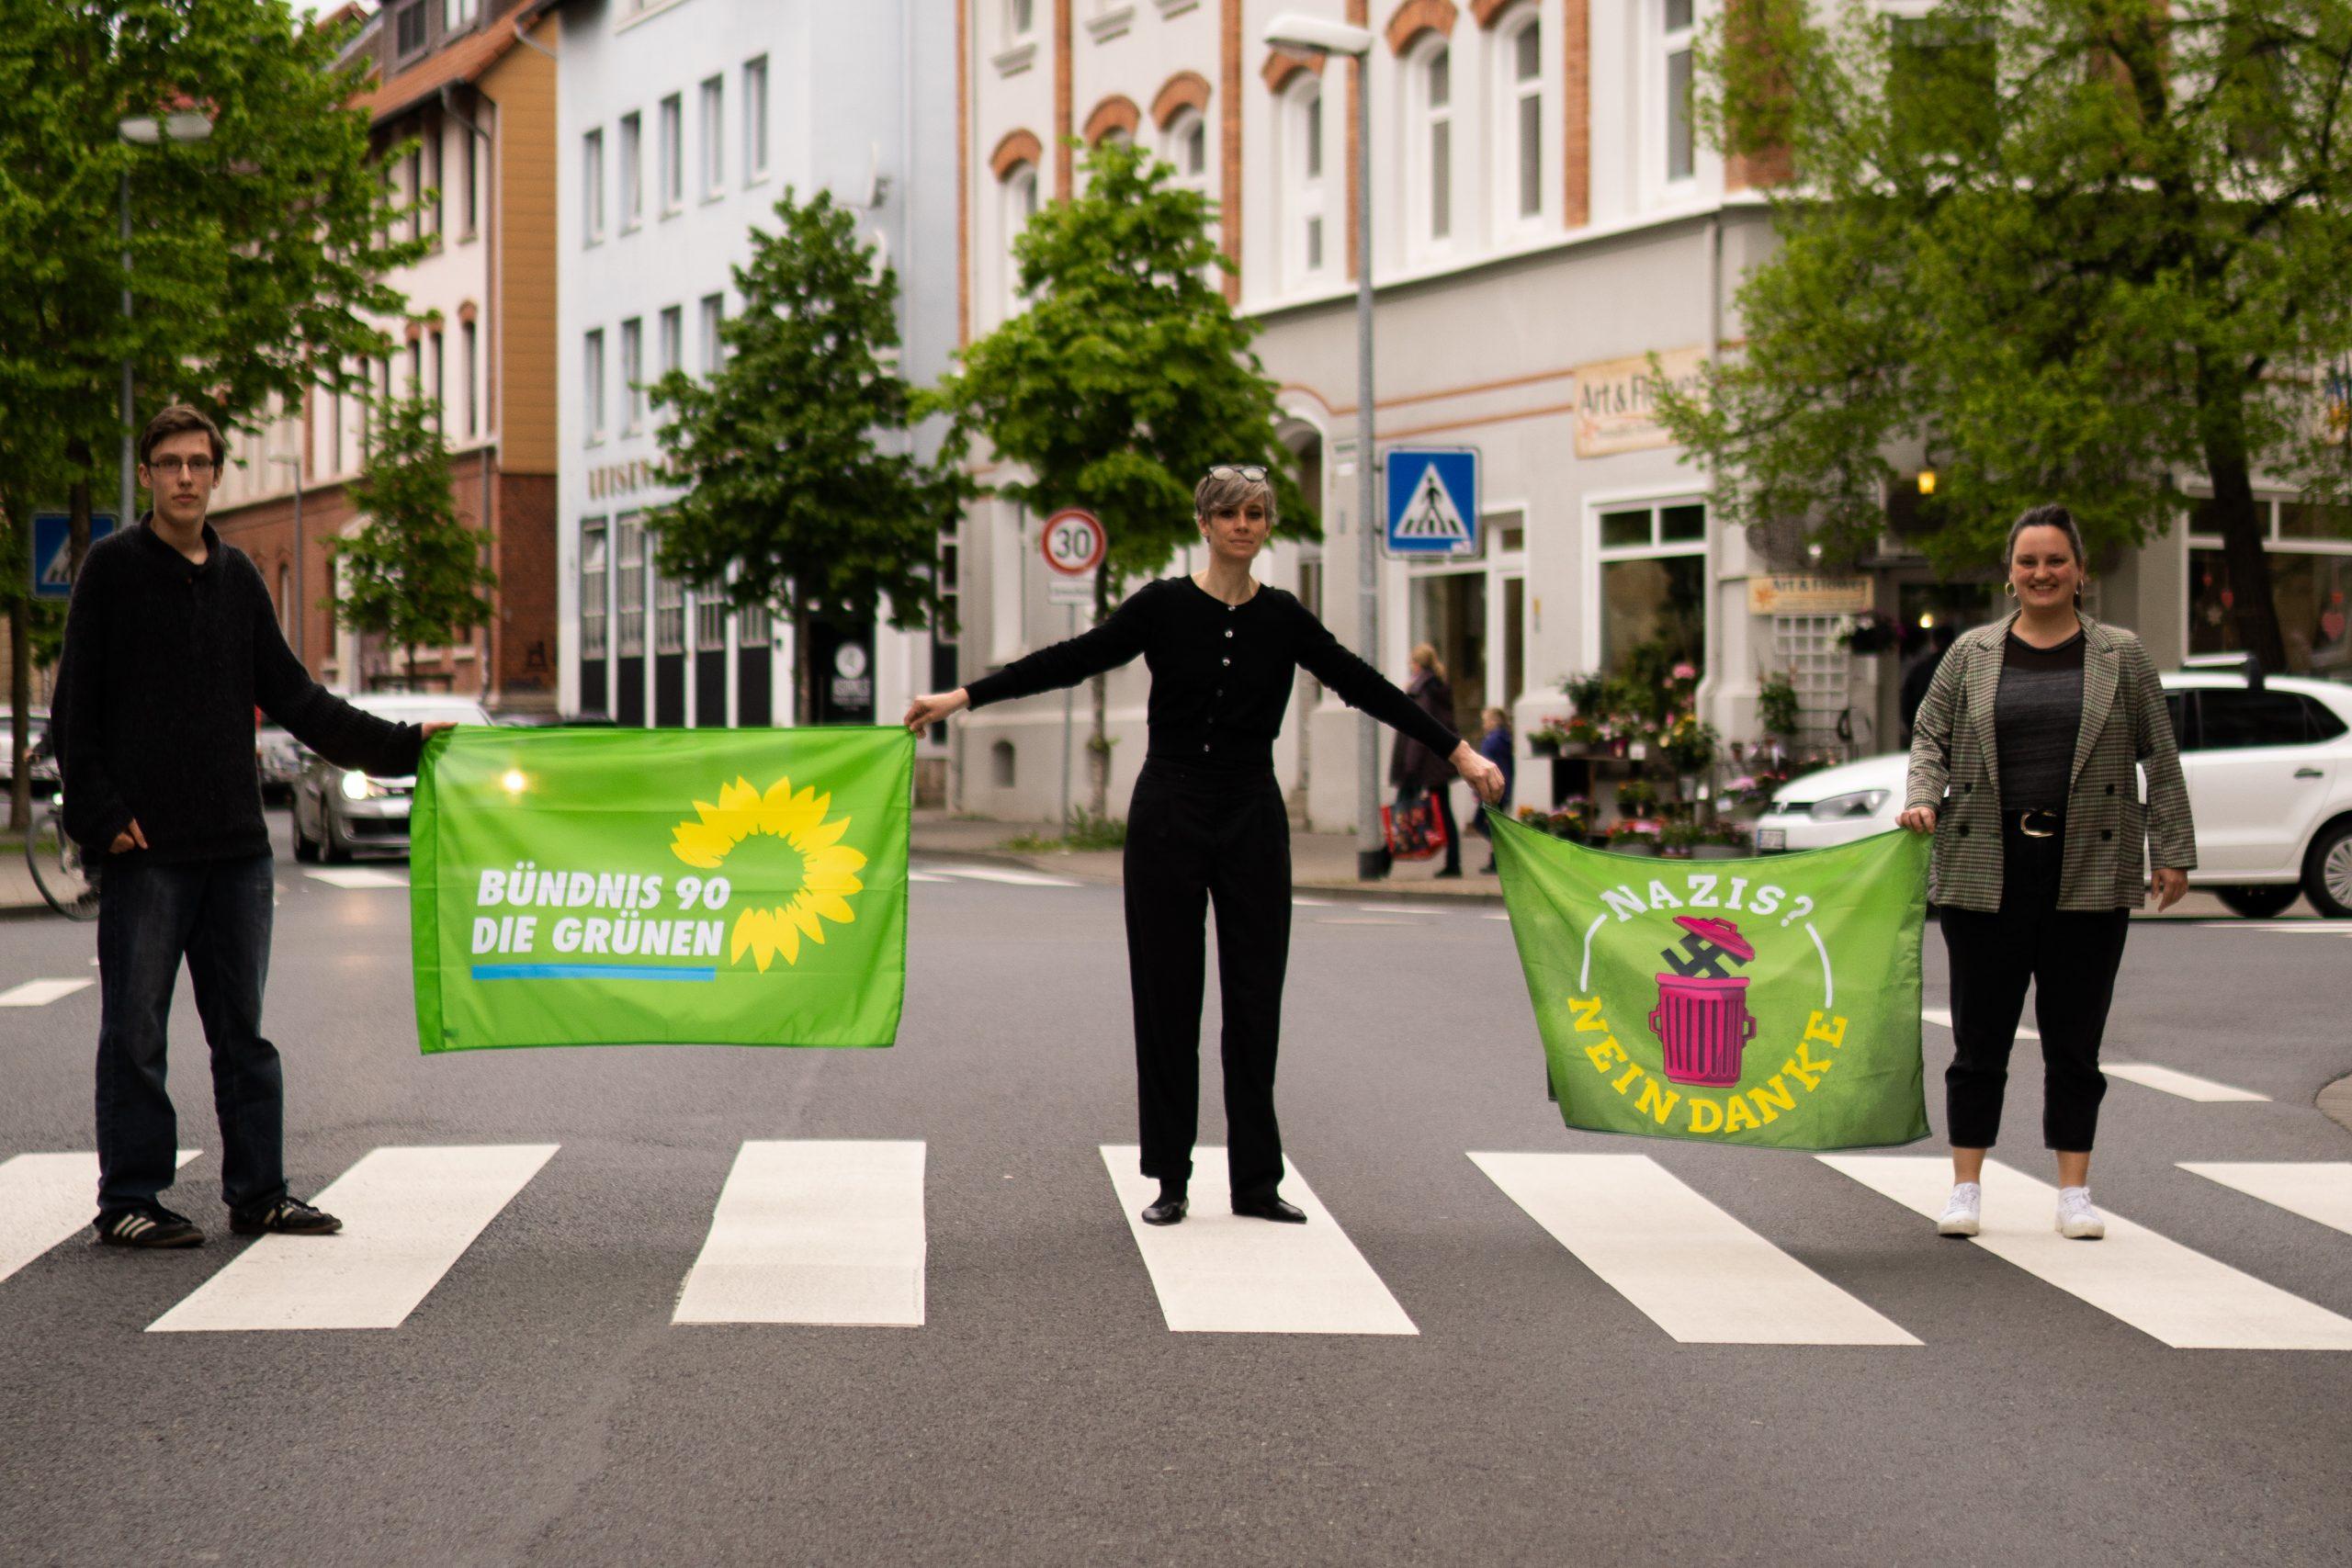 Grüne in Braunschweig stehen geschlossen gegen Rechts